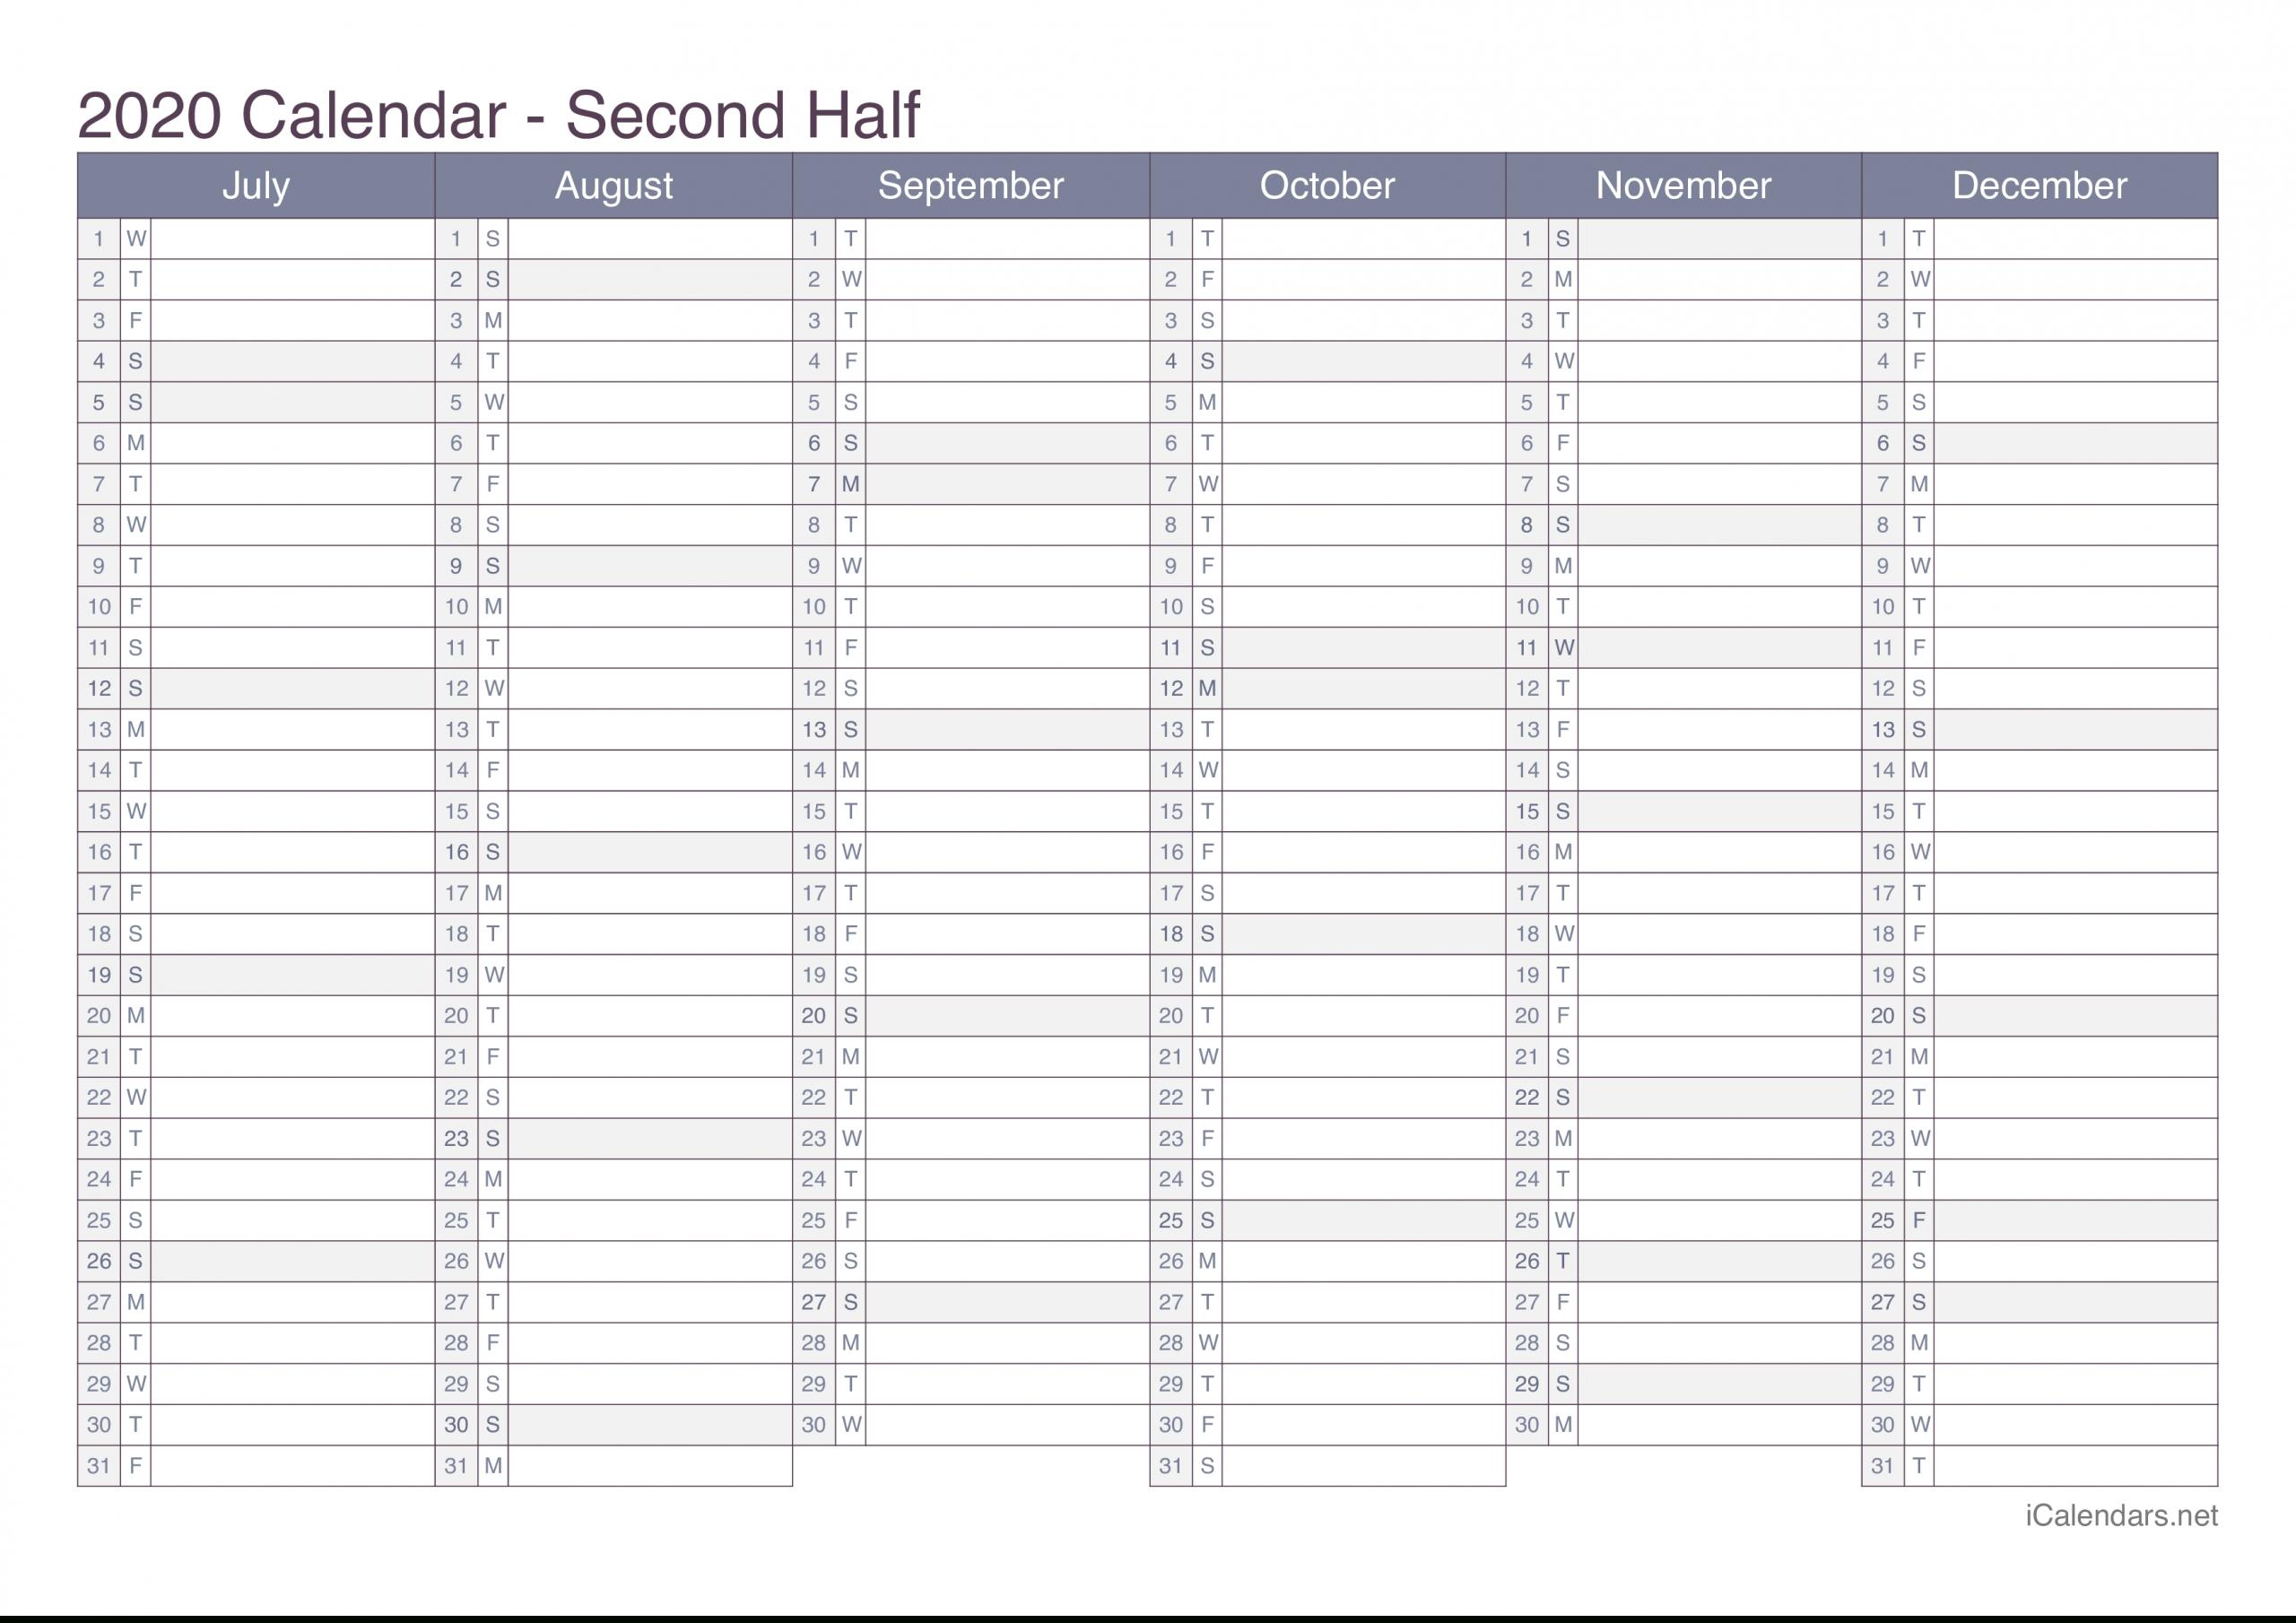 2020 Printable Calendar - Pdf Or Excel - Icalendars  Full Page Calendar Print Out